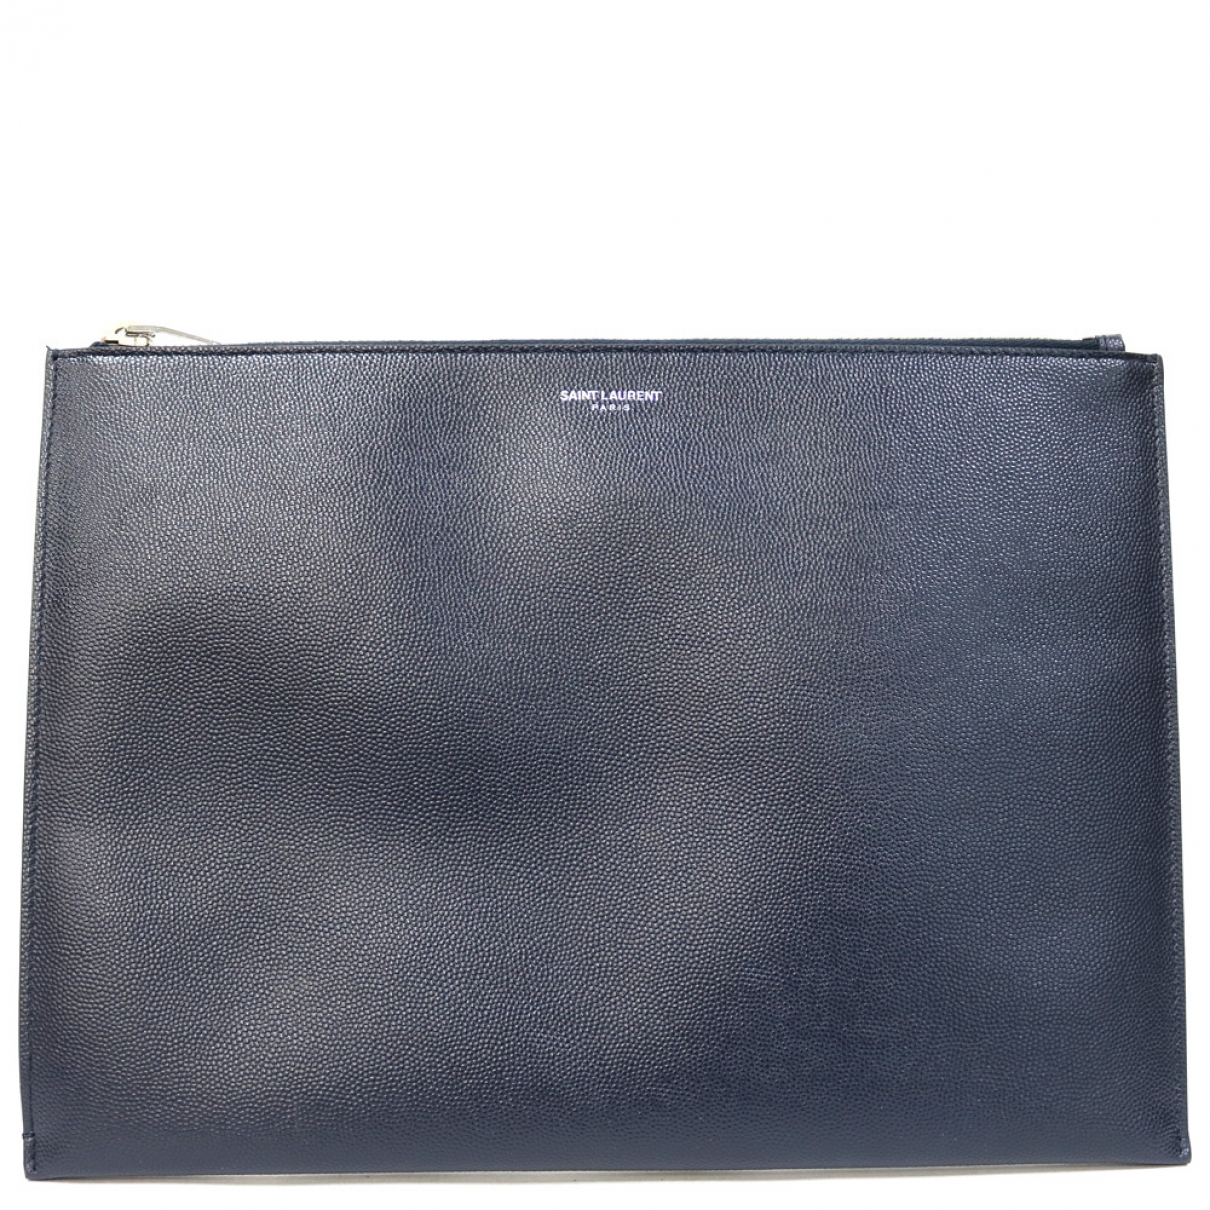 Saint Laurent \N Navy Leather Clutch bag for Women \N